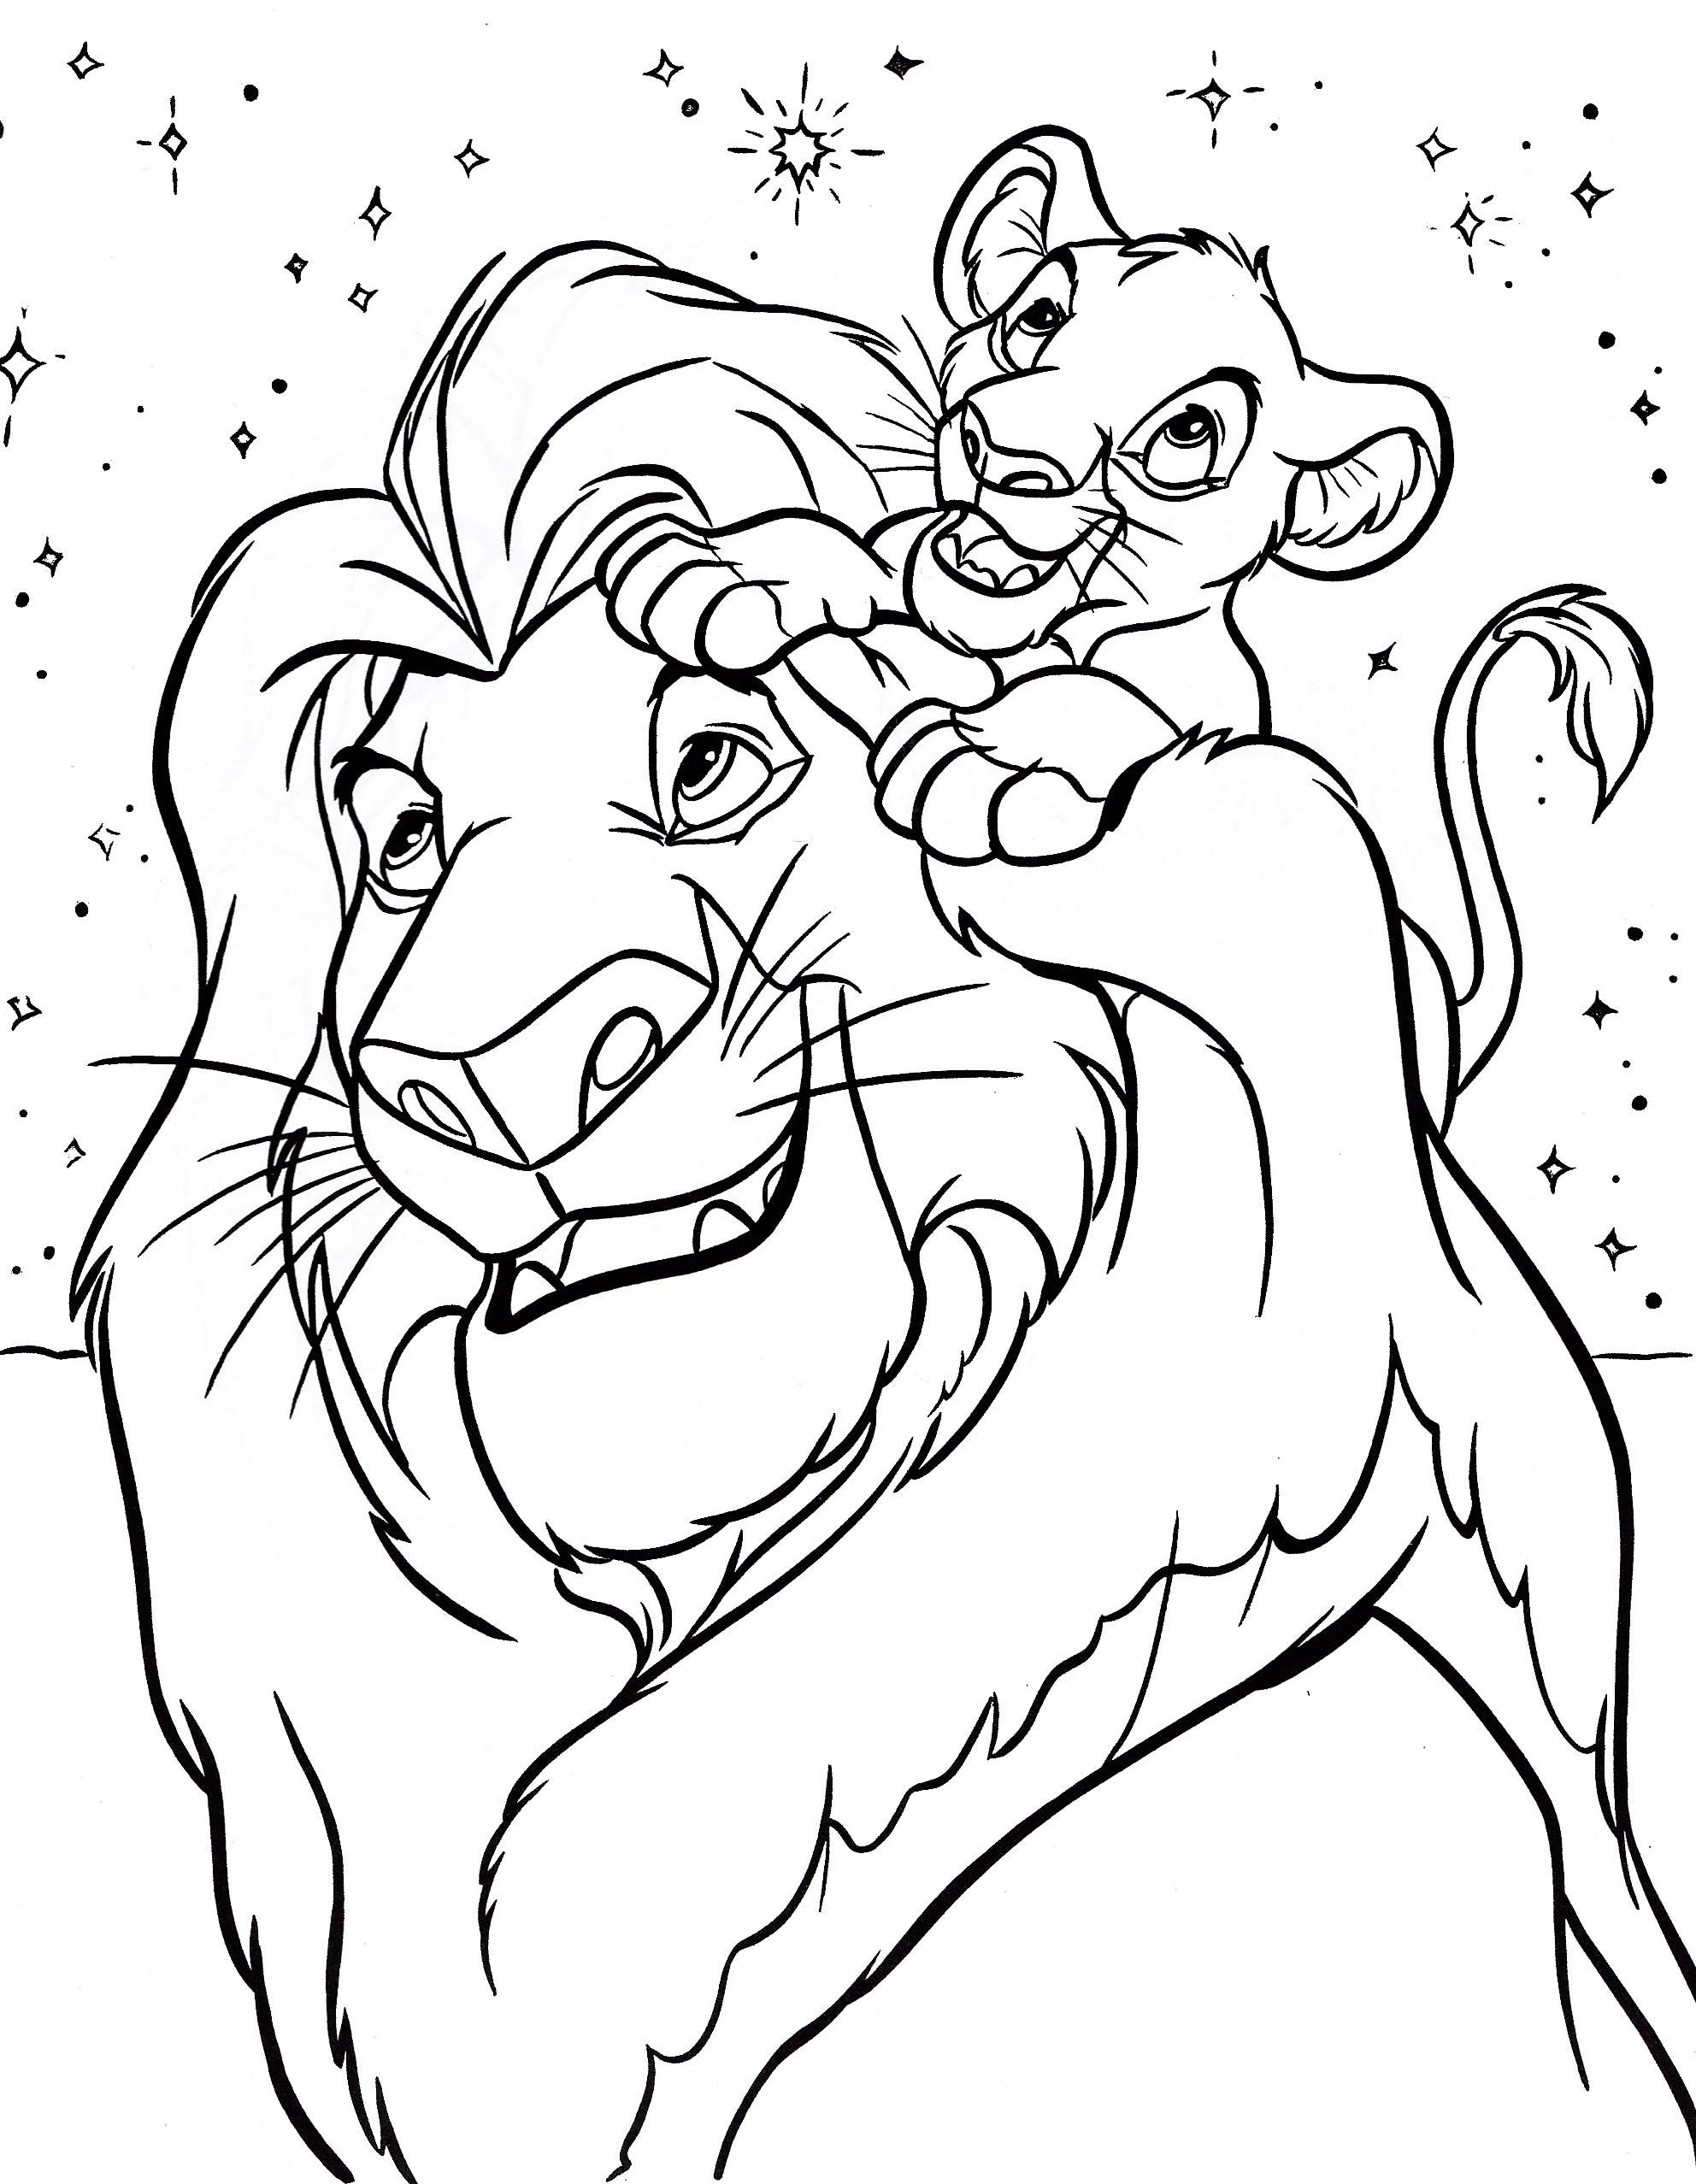 Ausmalbilder Disney Prinzessin Jasmin Malvorlagen Tiere Disney Malvorlagen Malvorlagen